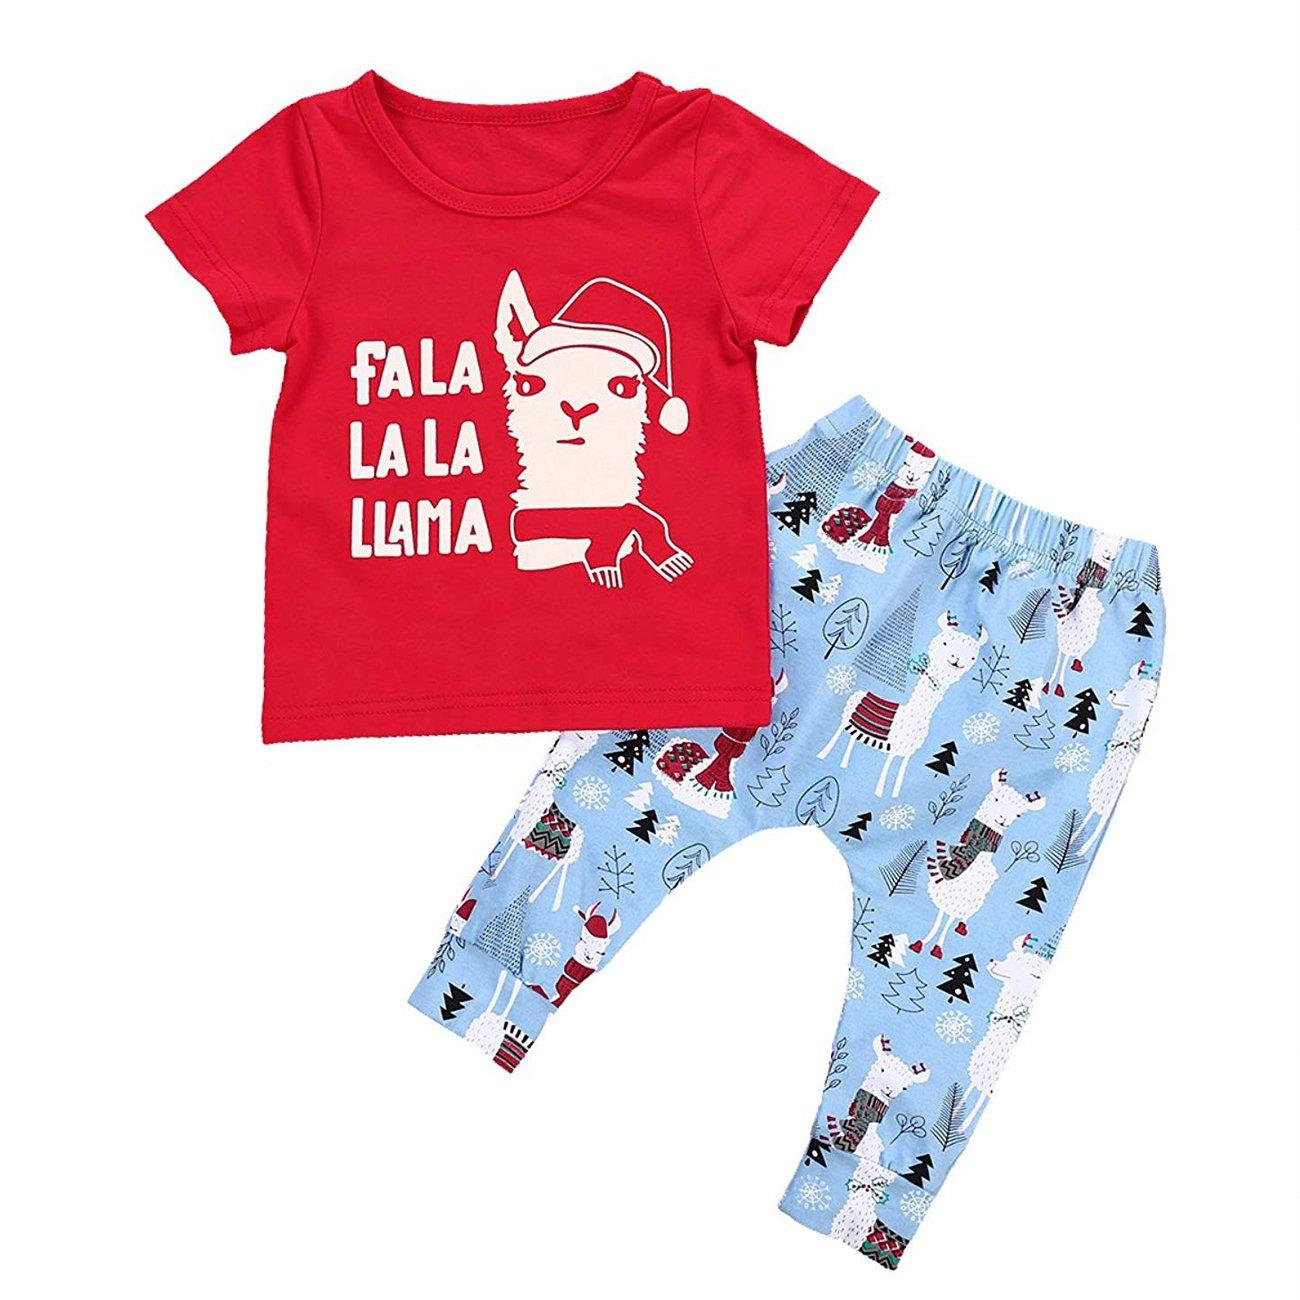 Babibeauty Christmas Baby Girls Boys Llama Clothes Set Letter Print Short Sleeve T-Shirt + Alpaca Pants Set Outfits